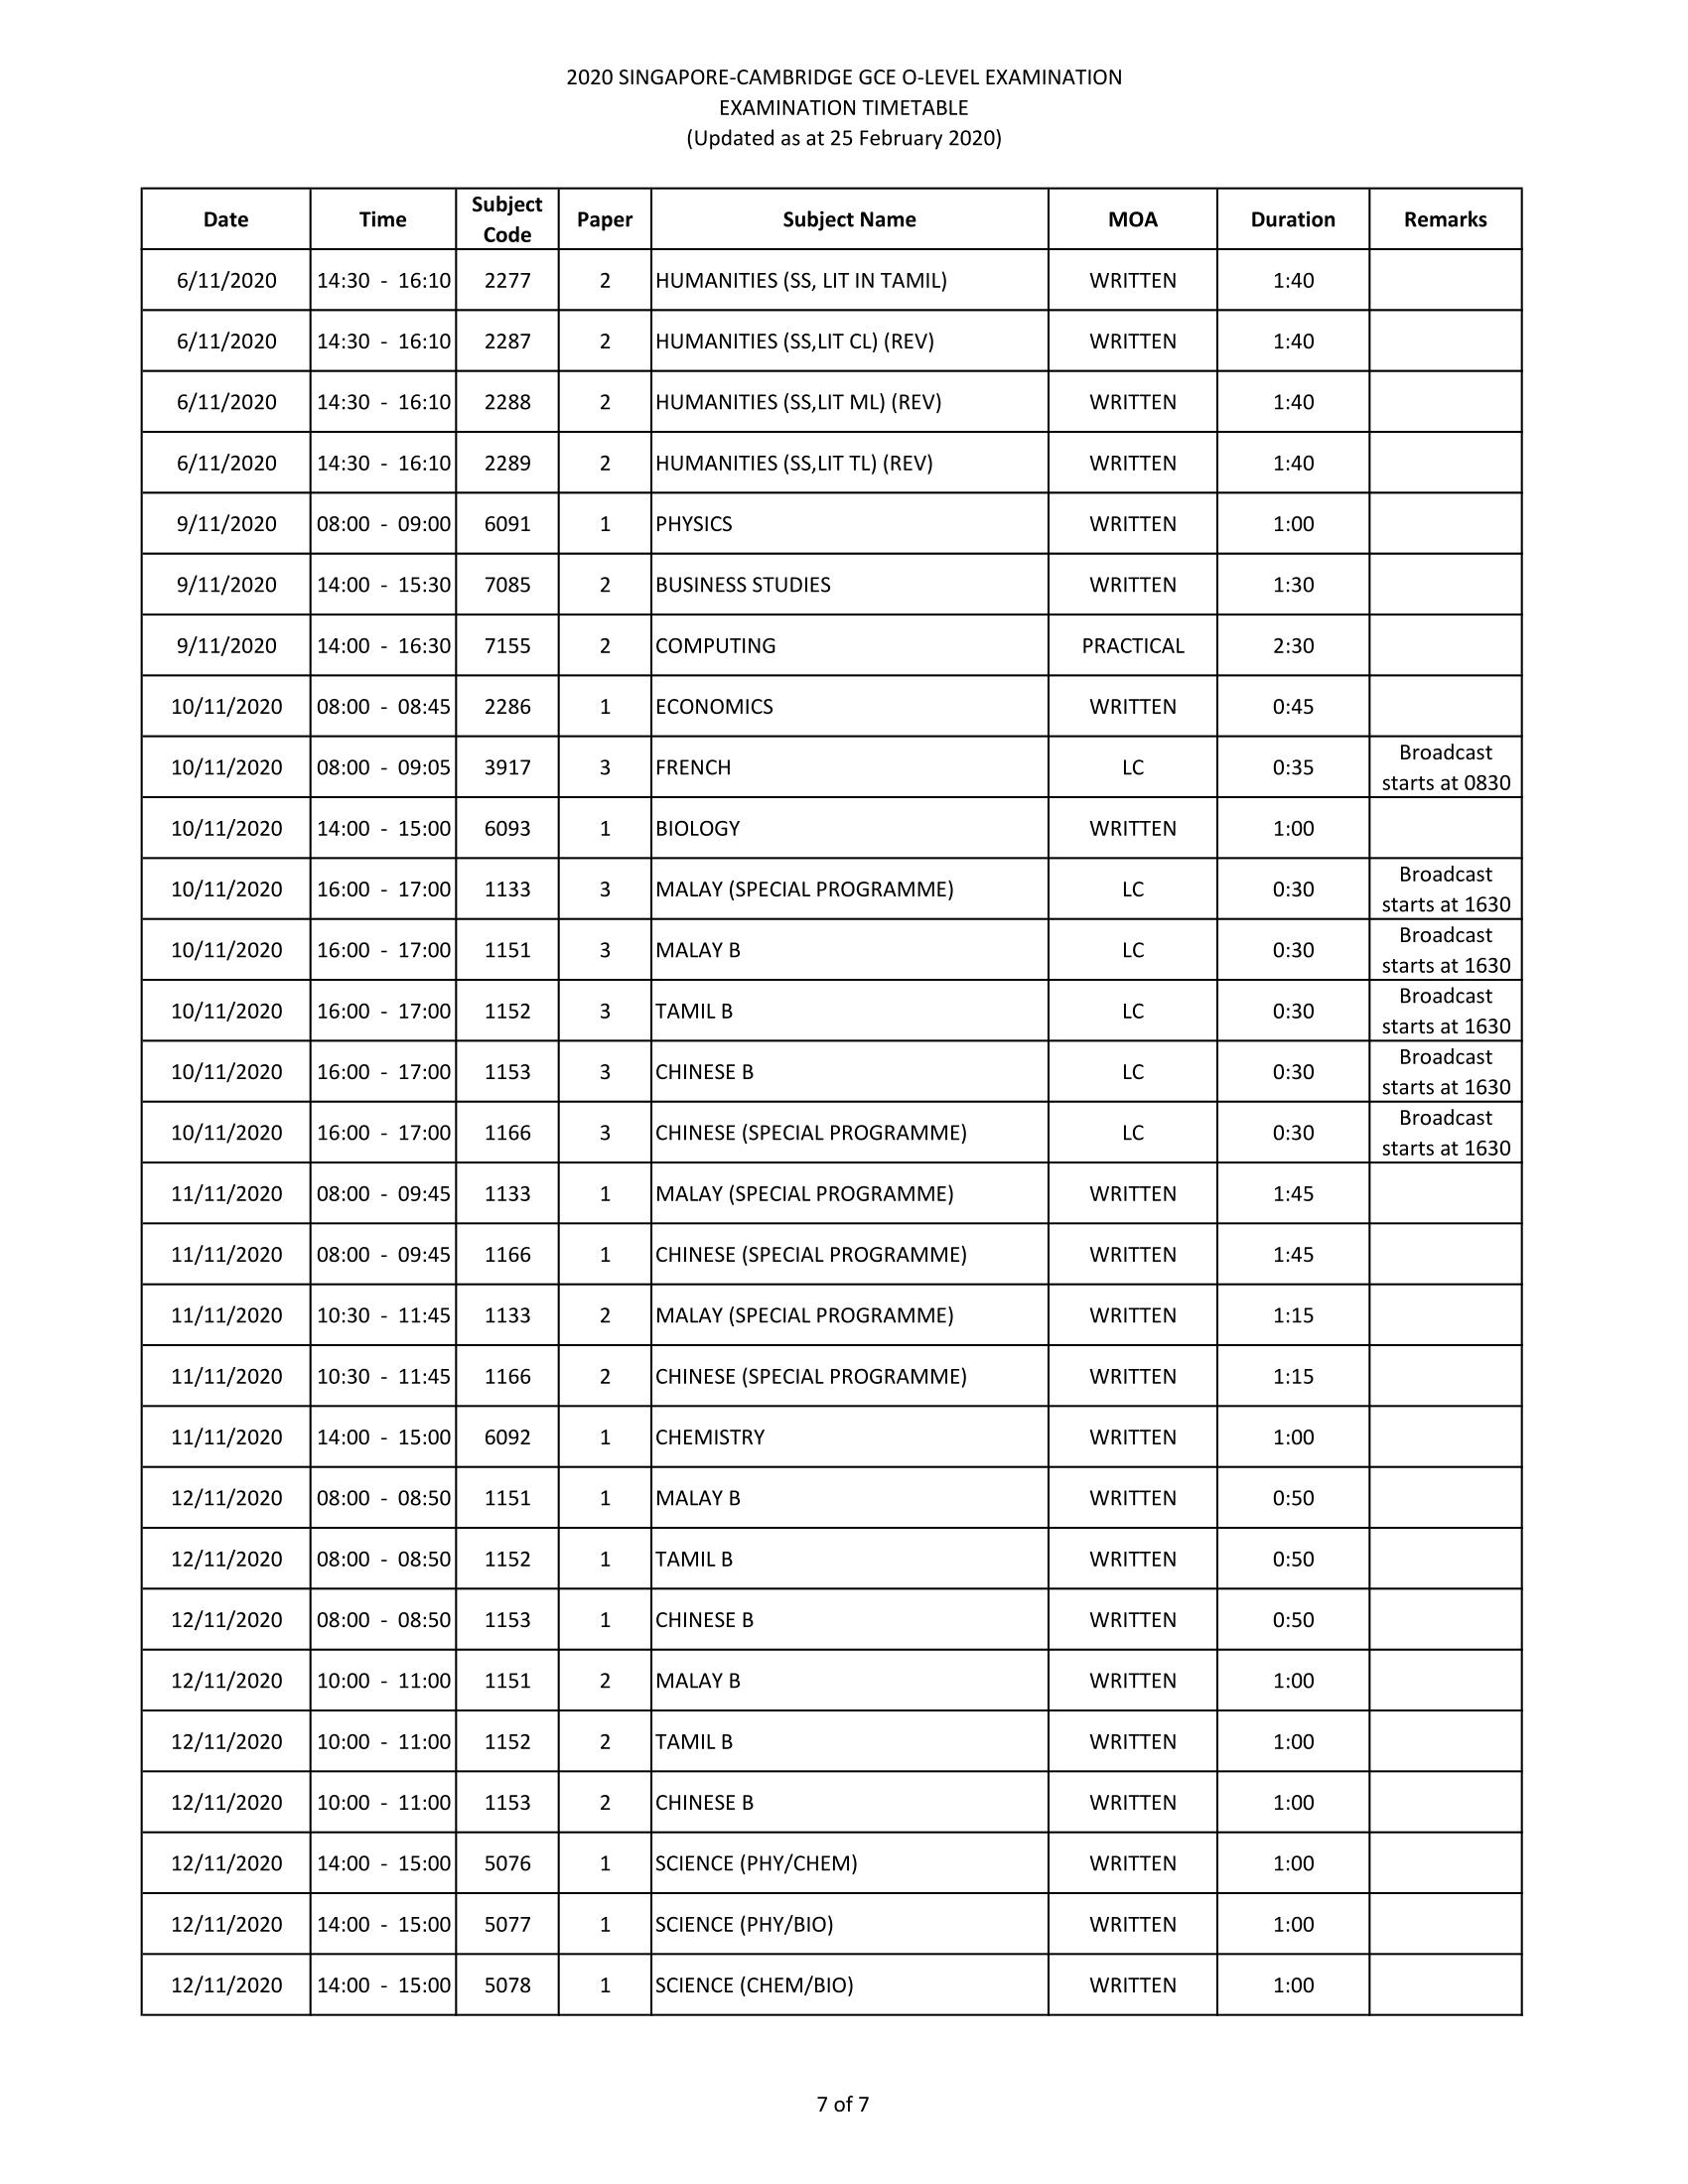 O Level Exam Schedule 2020 7